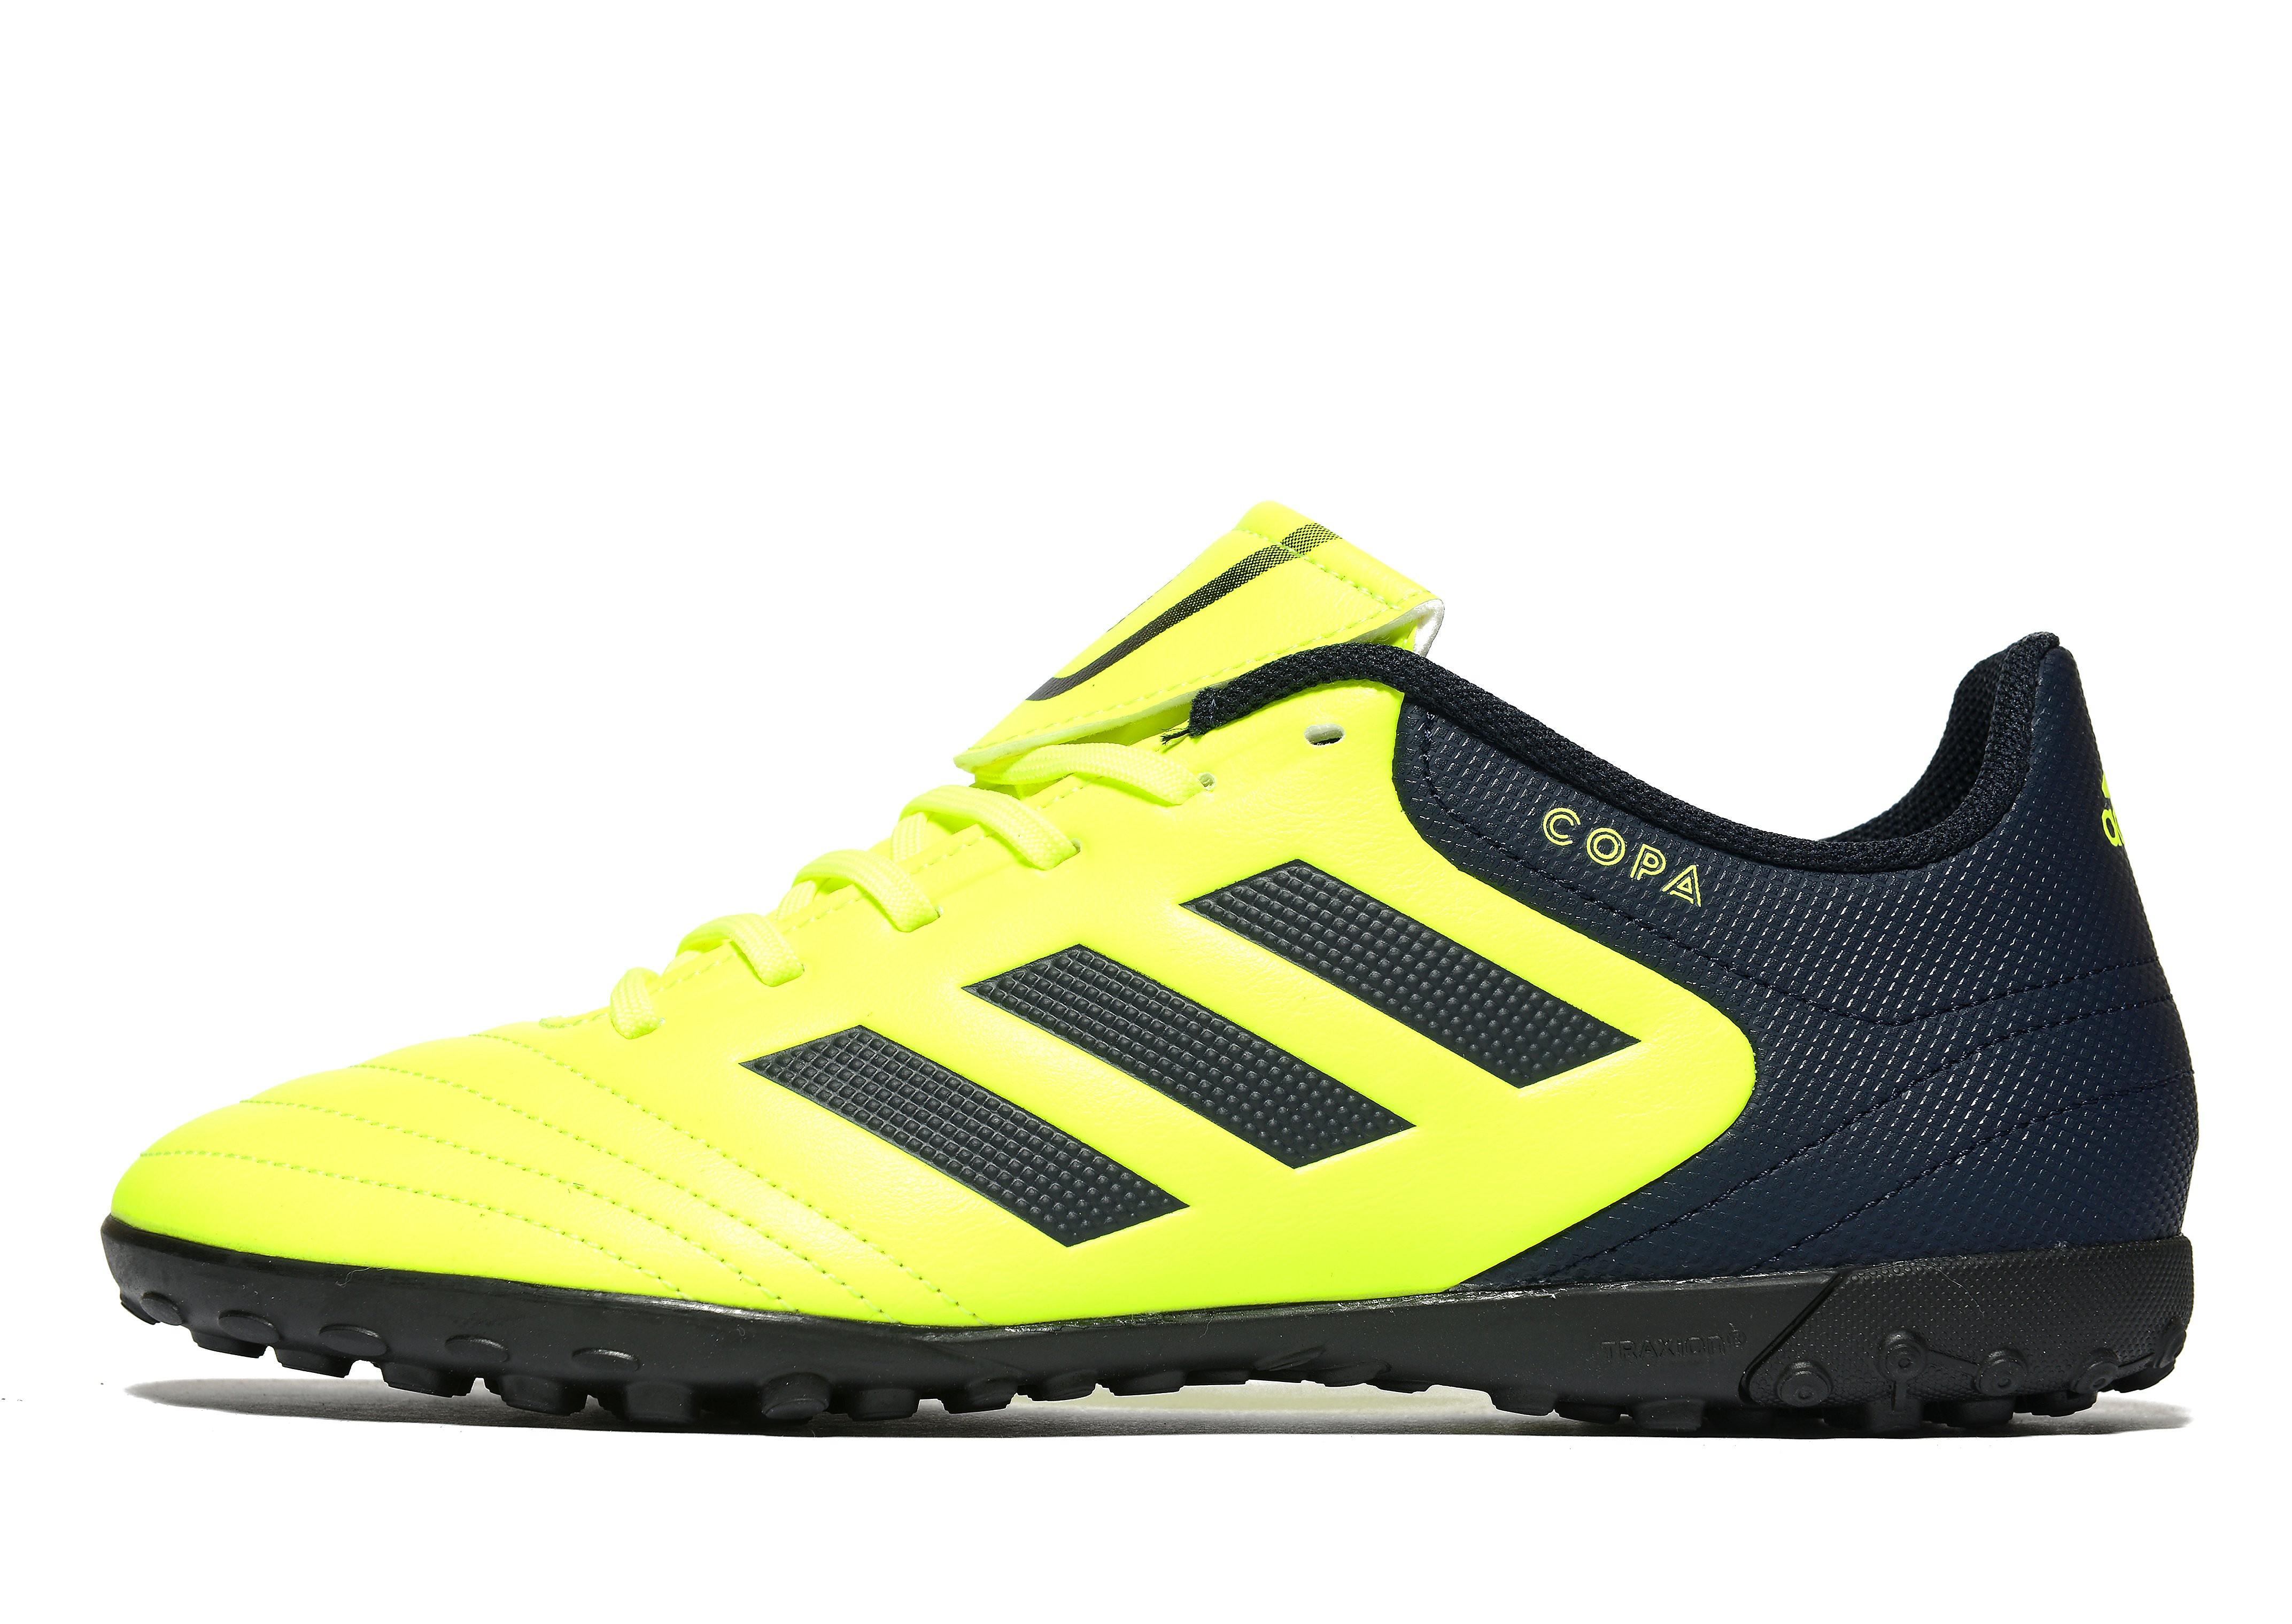 adidas Ocean Storm Copa 17.4 TF